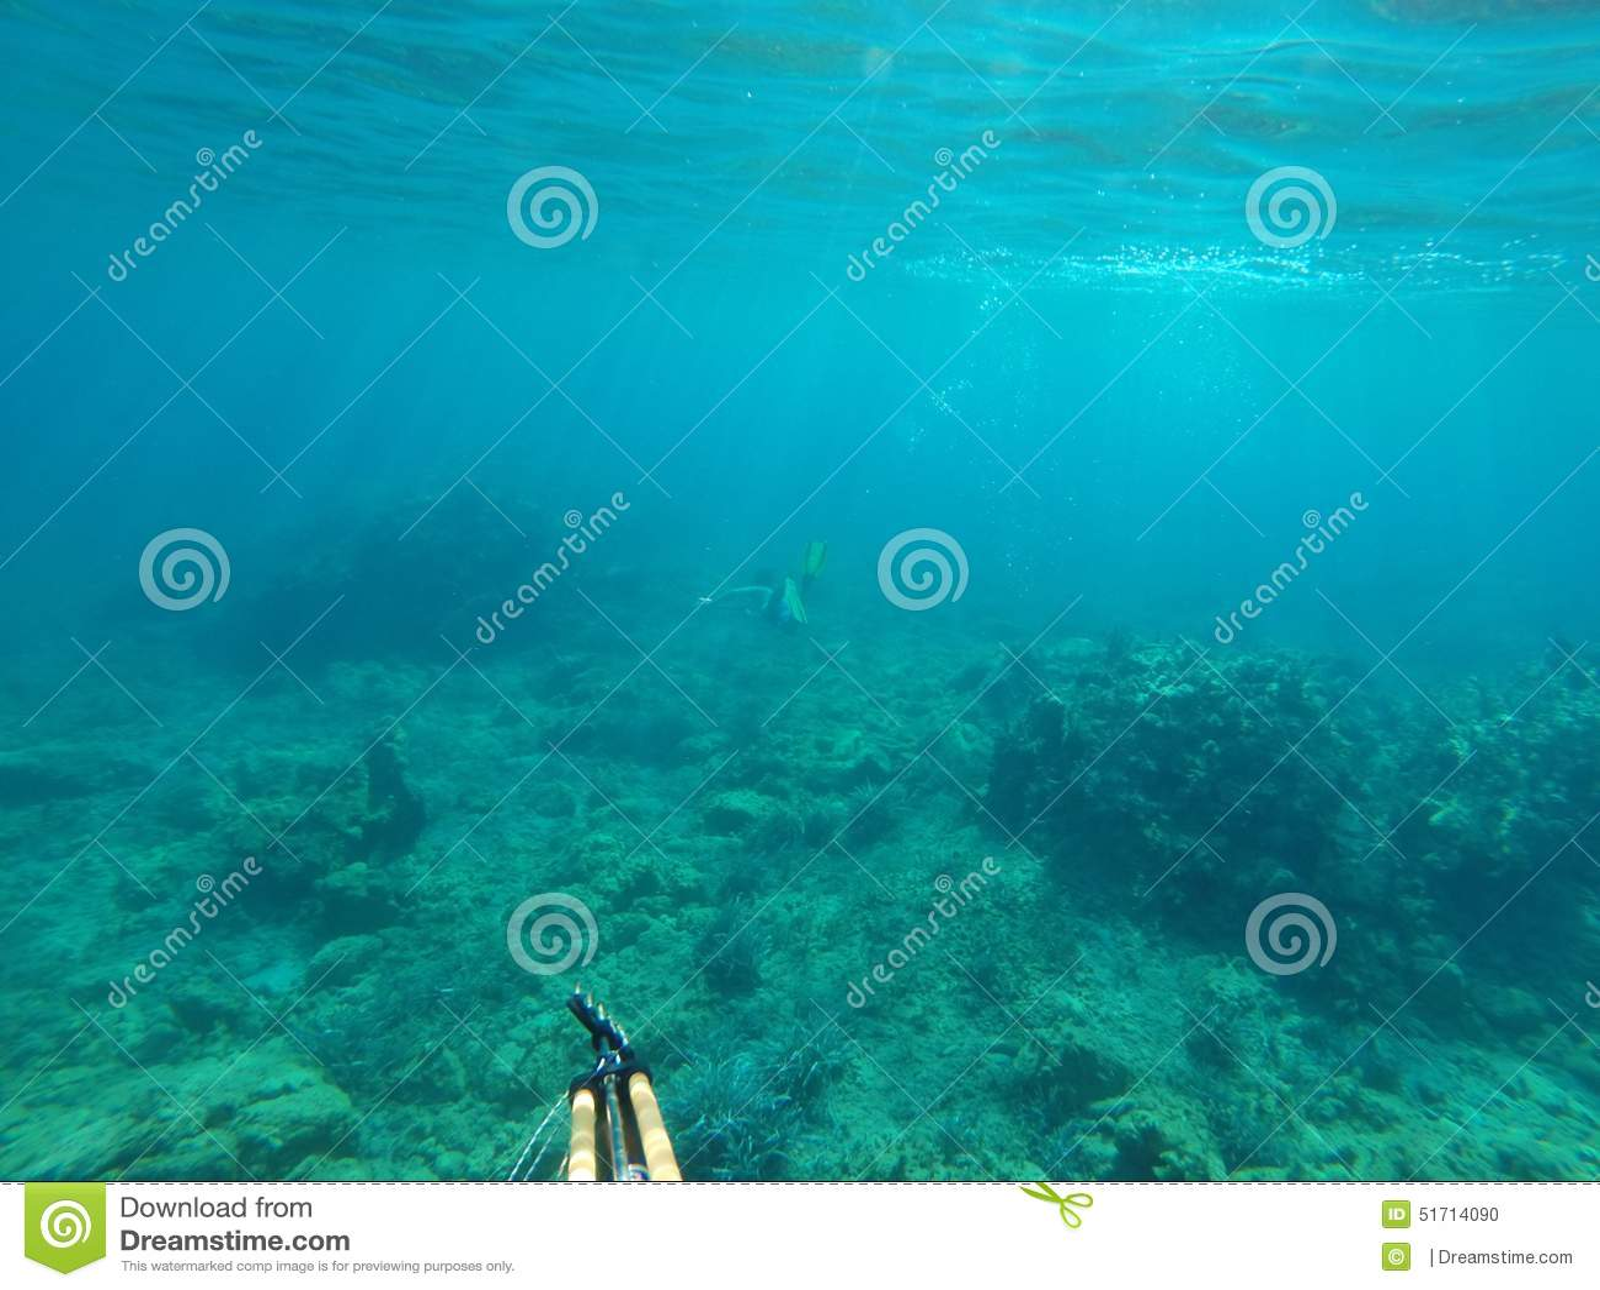 underwater fishing stock photo - image: 51714090, Reel Combo